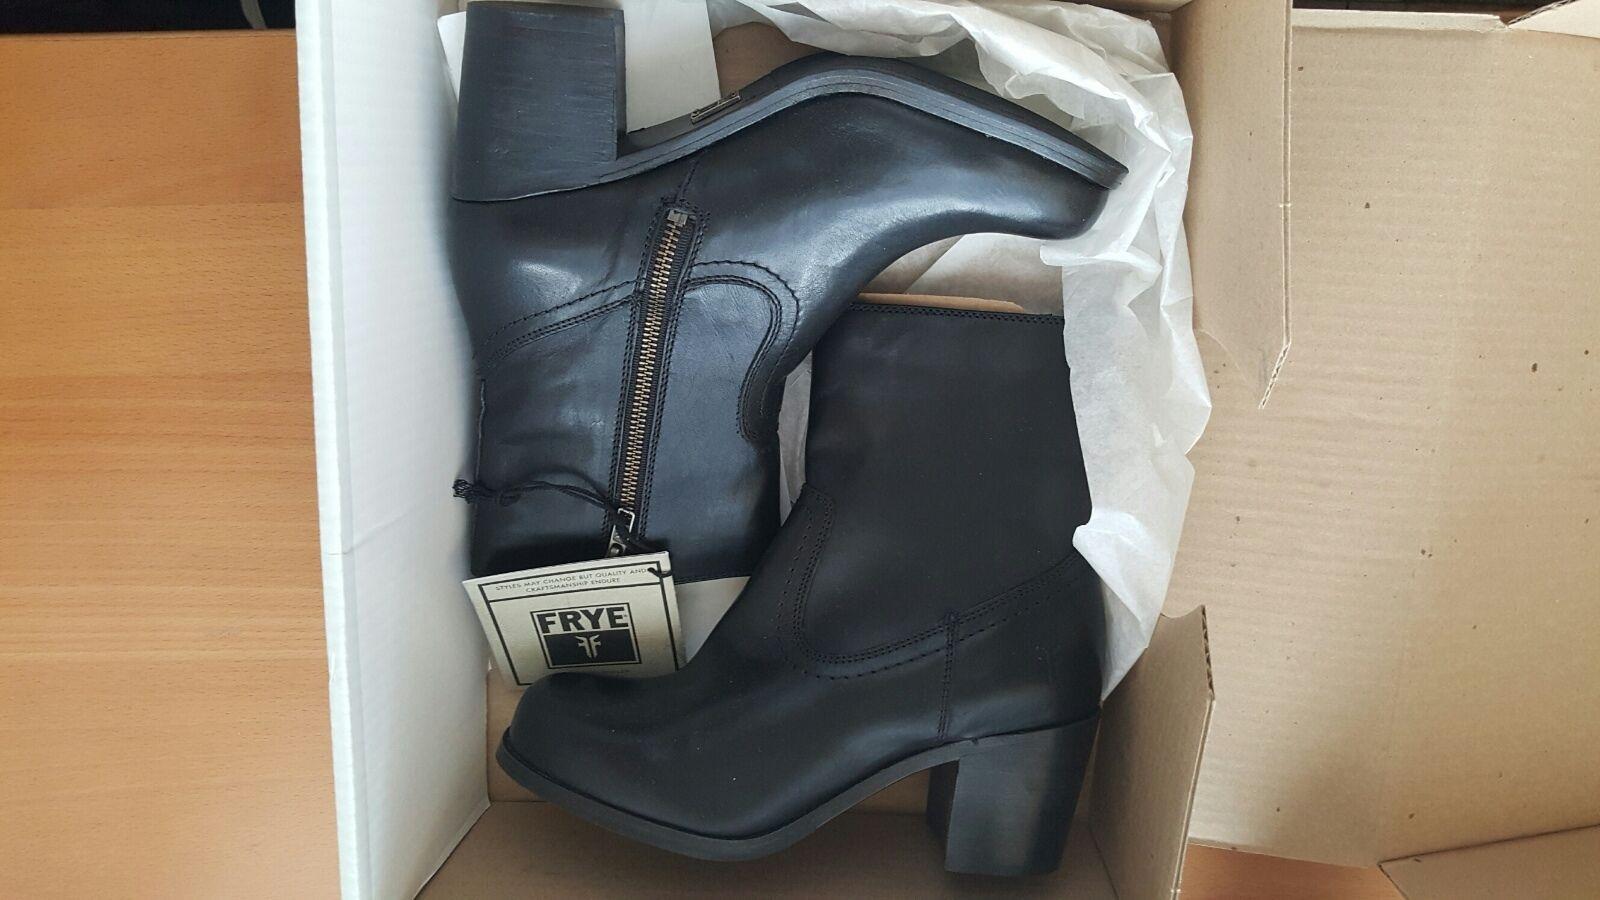 FRYE Kendall NIB short zip boots shoes black US 7.5